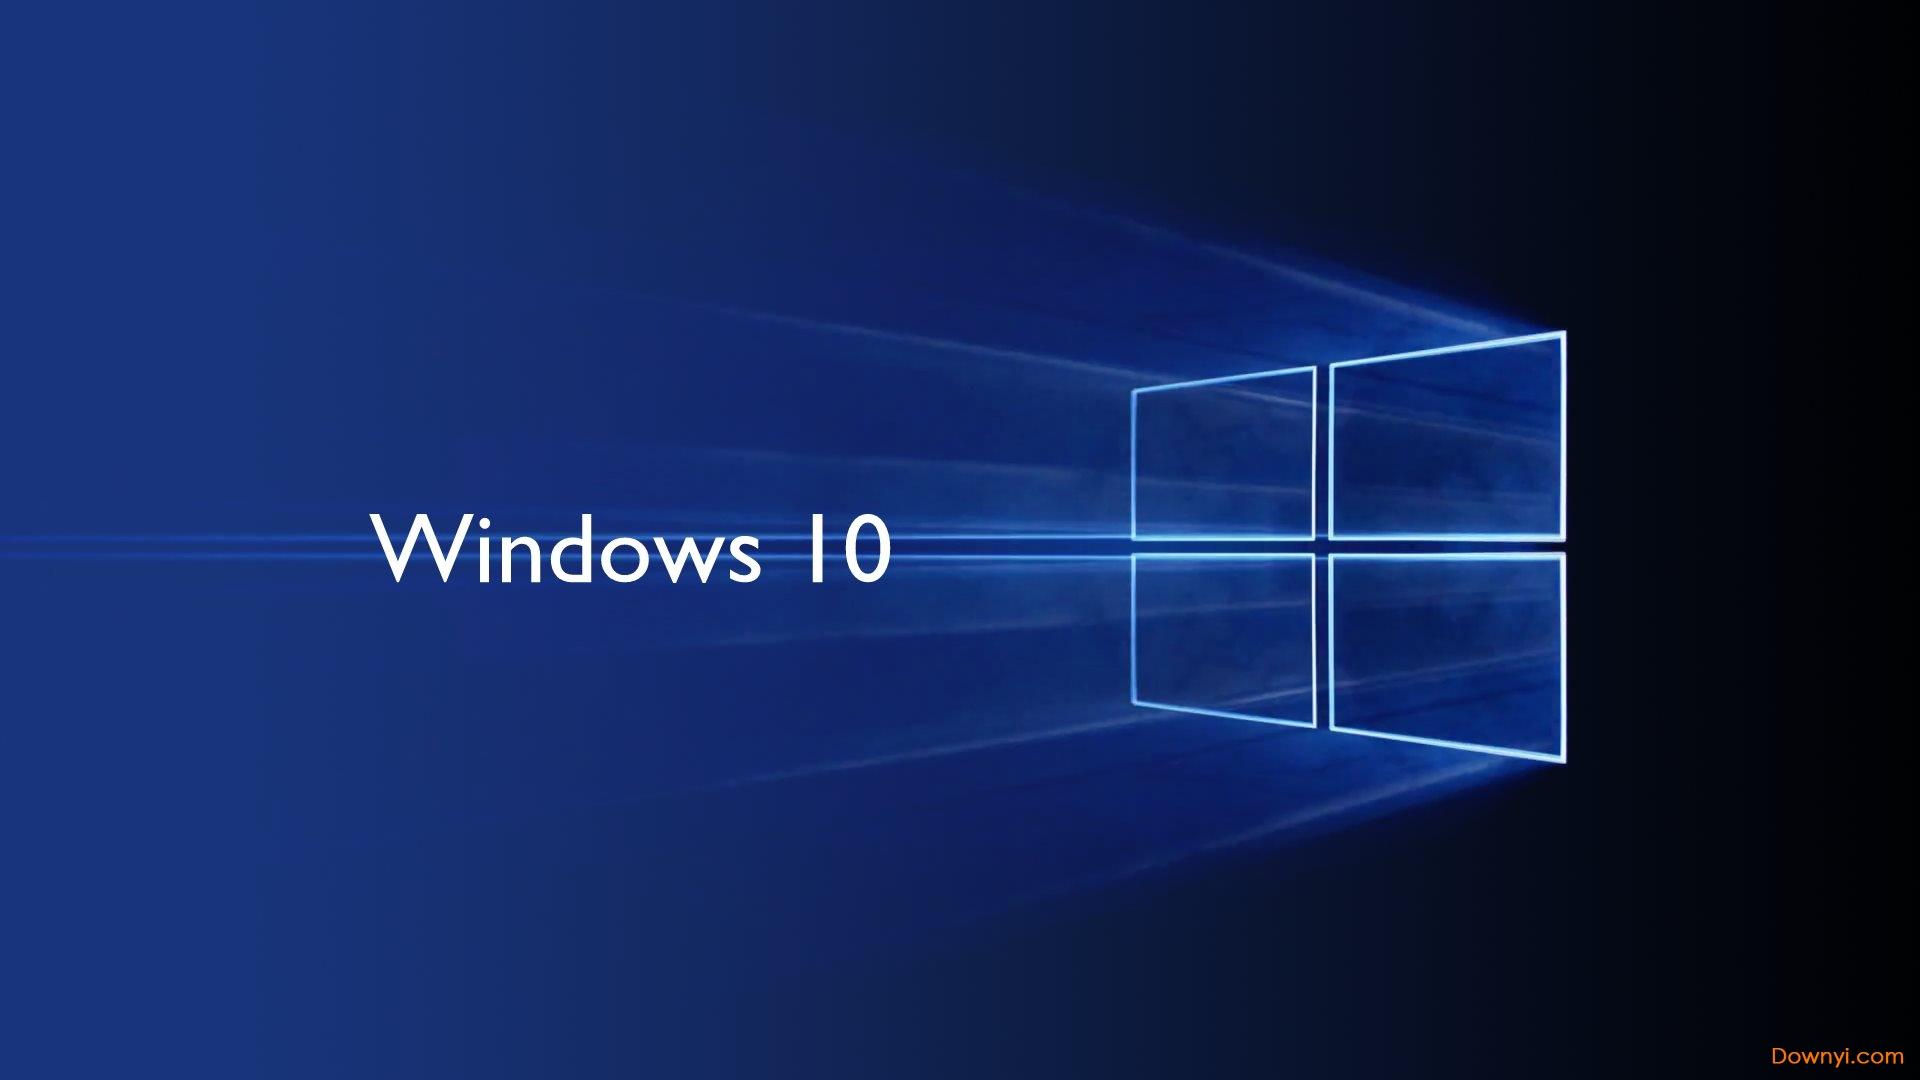 微软kb4507469补丁